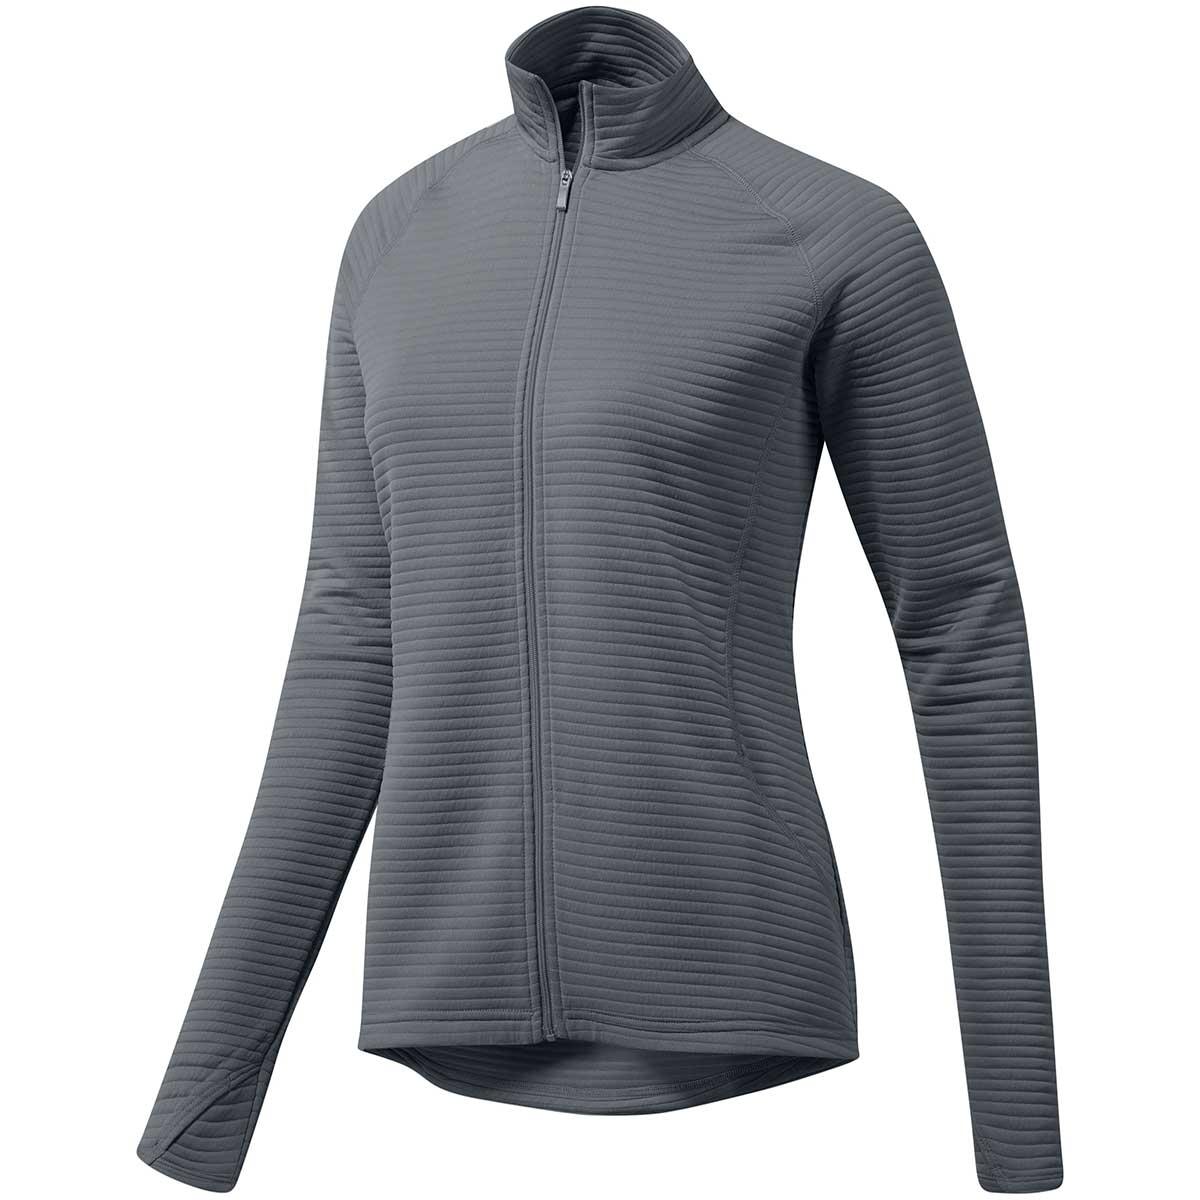 Adidas Women's Essential Text Full Zip Jacket - Grey